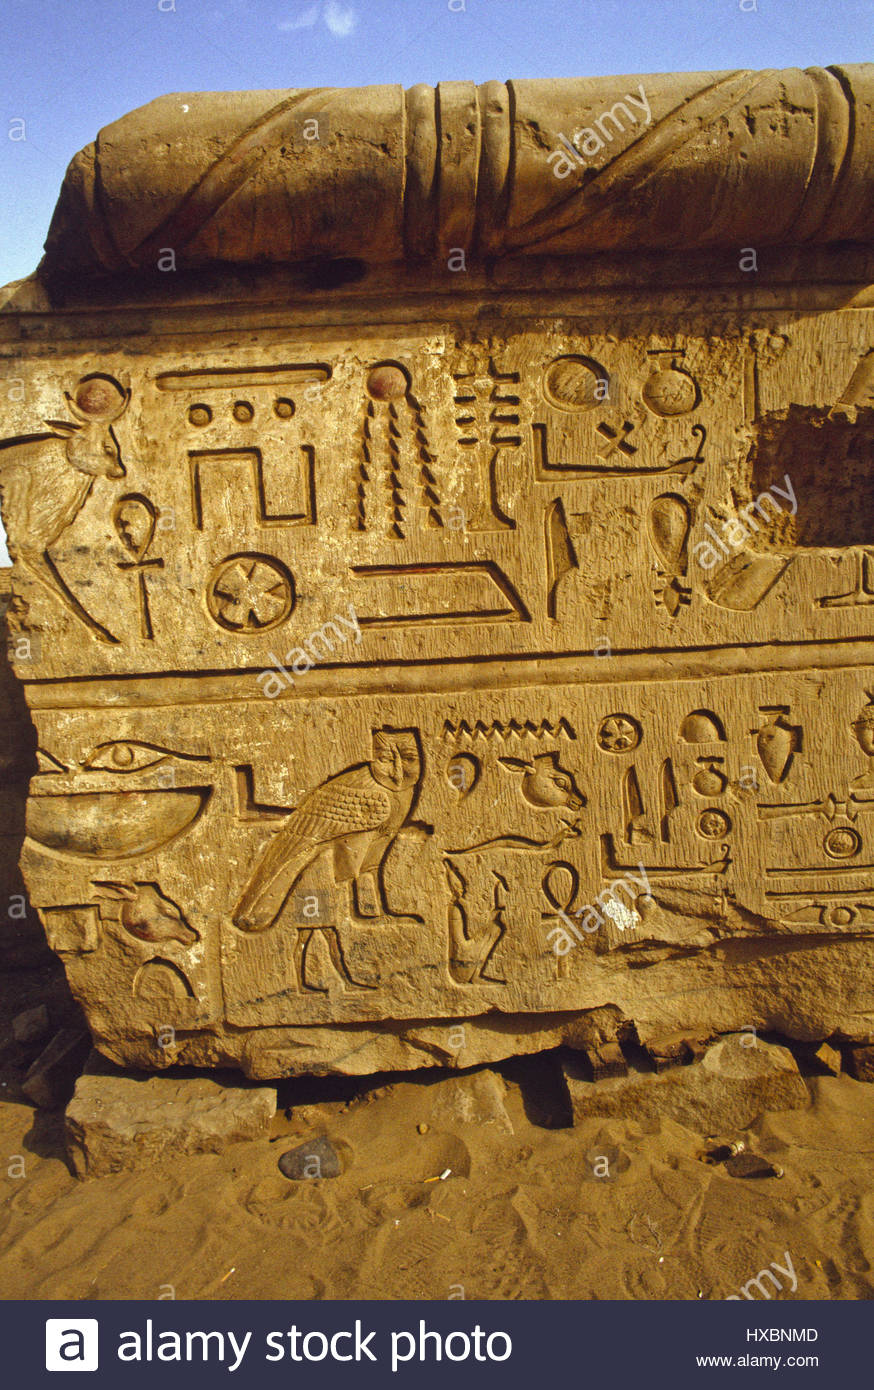 Kom Ombo Ancient Egyptian Hieroglyphs Deep Cut Sharp Symbols Seated